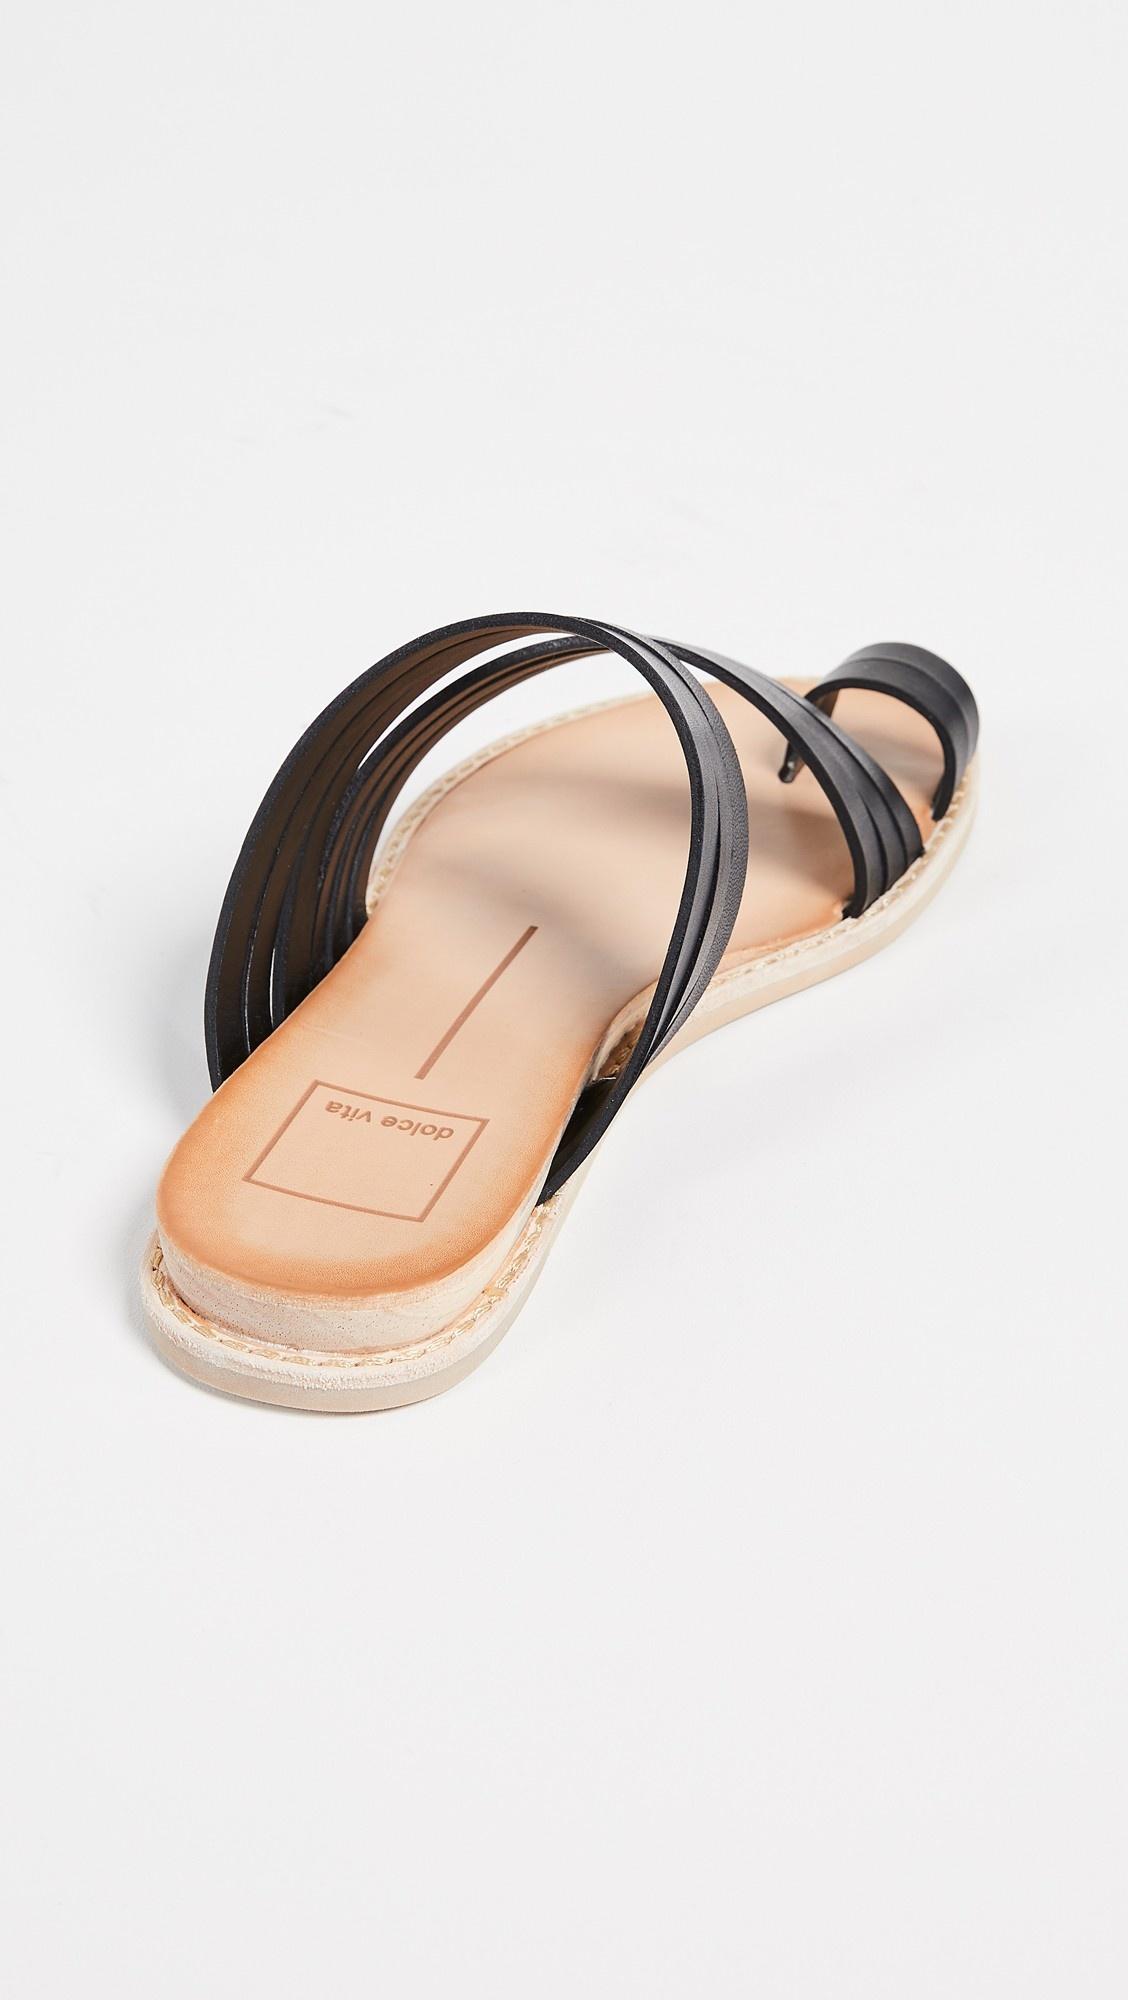 Dolce Vita Nelly Sandal - Black Leather